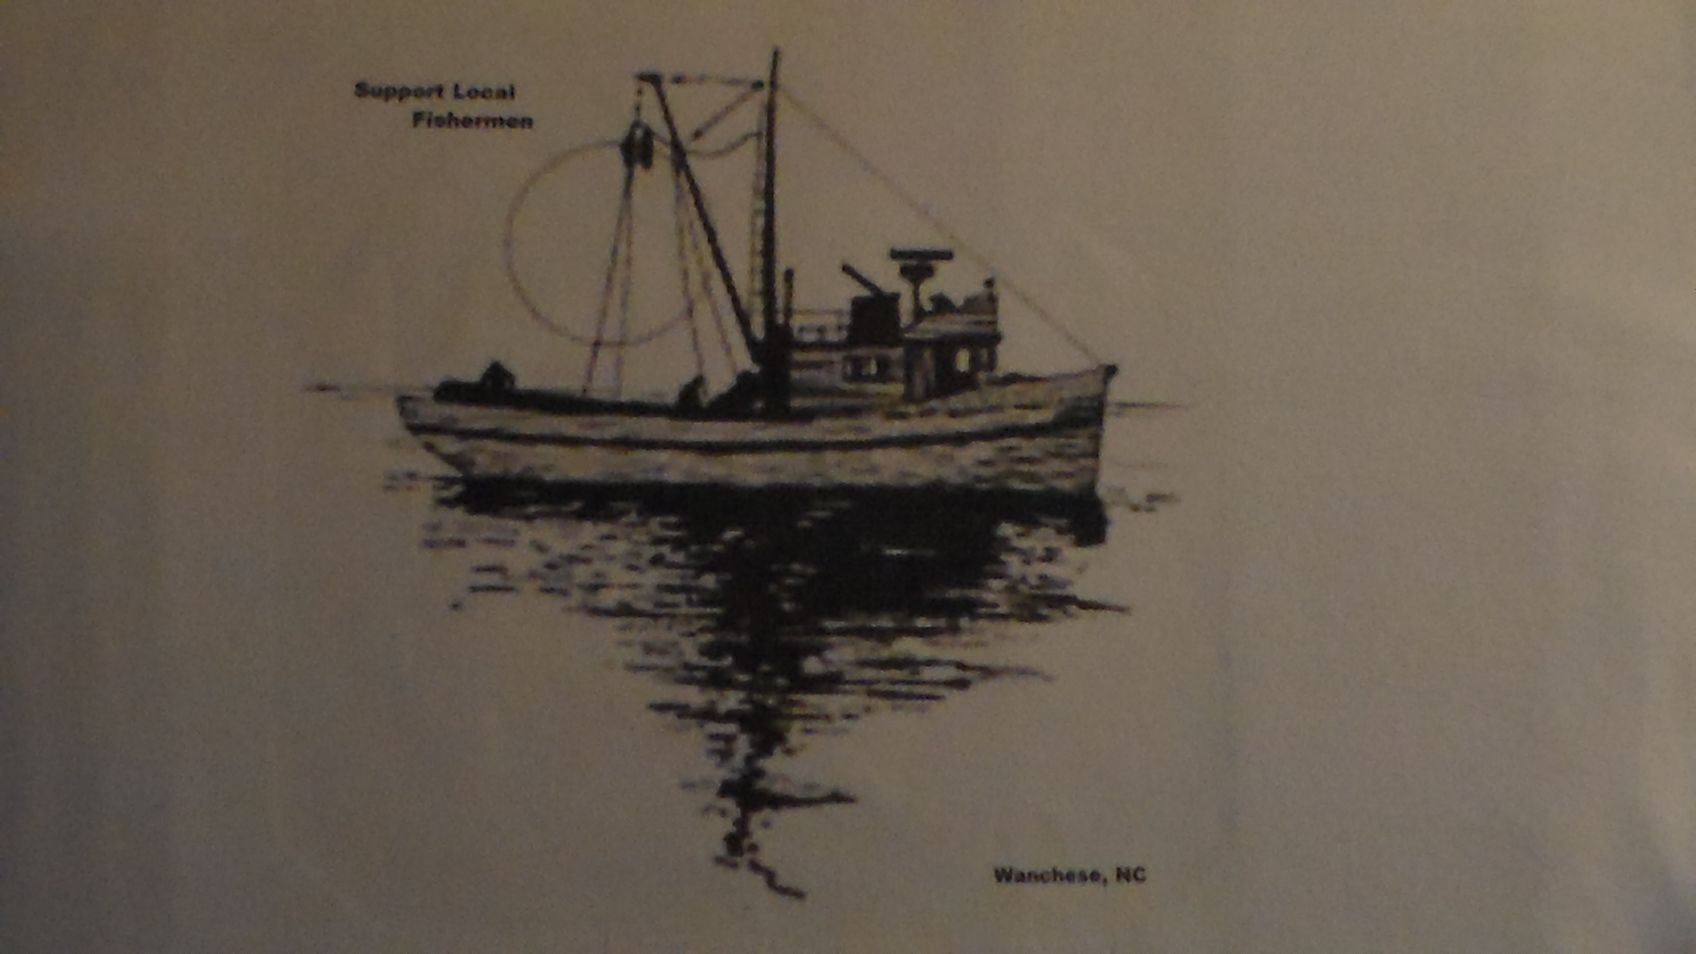 Support local fishermen